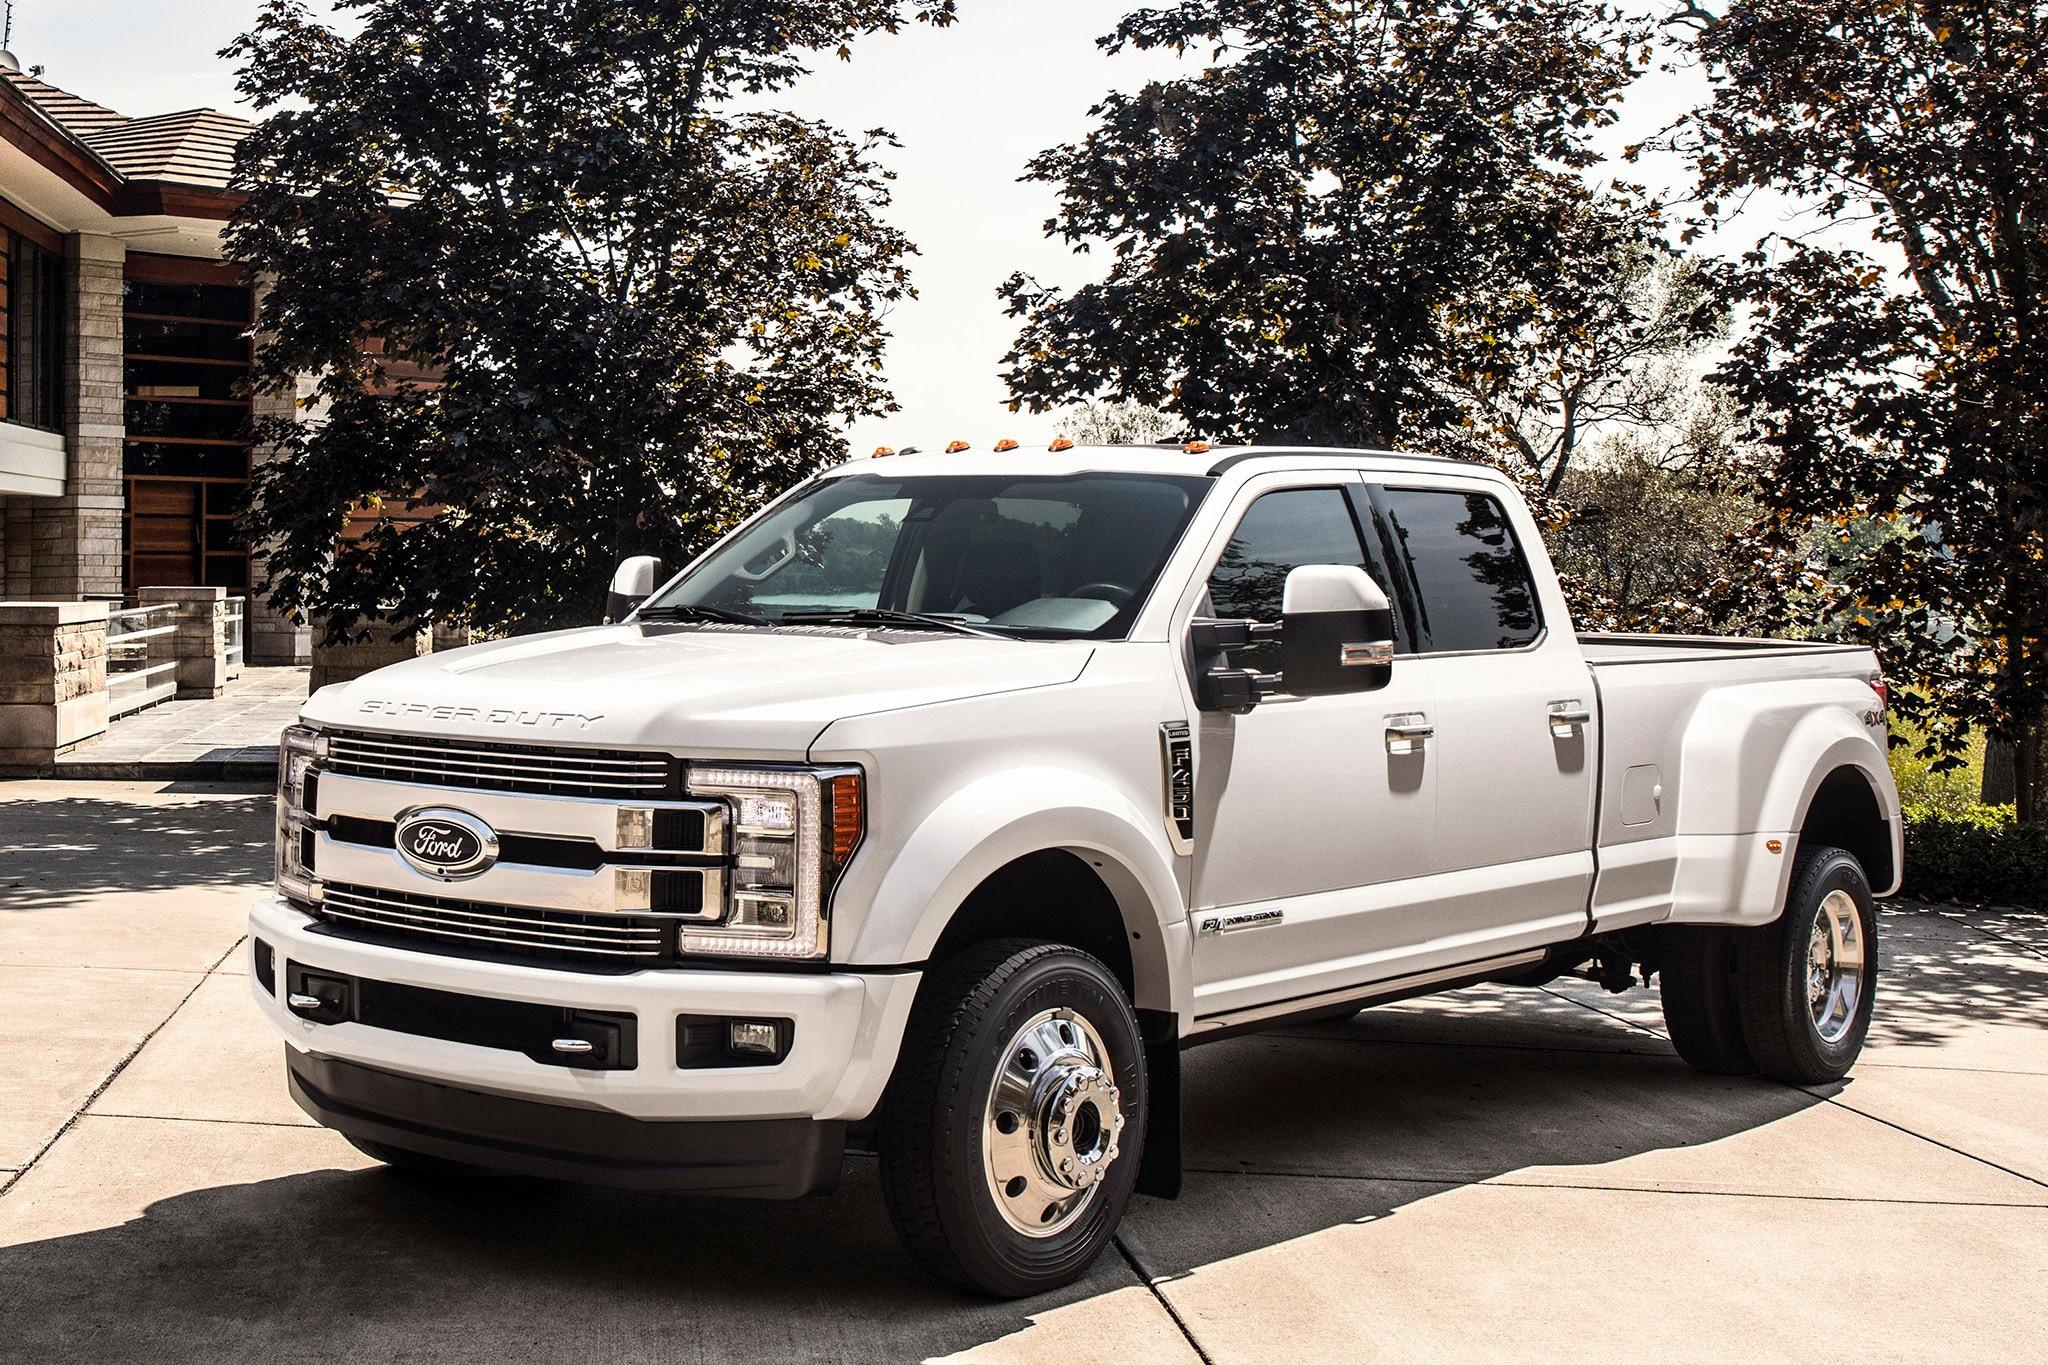 ford f series super duty trucks get super fancy automobile magazine. Black Bedroom Furniture Sets. Home Design Ideas